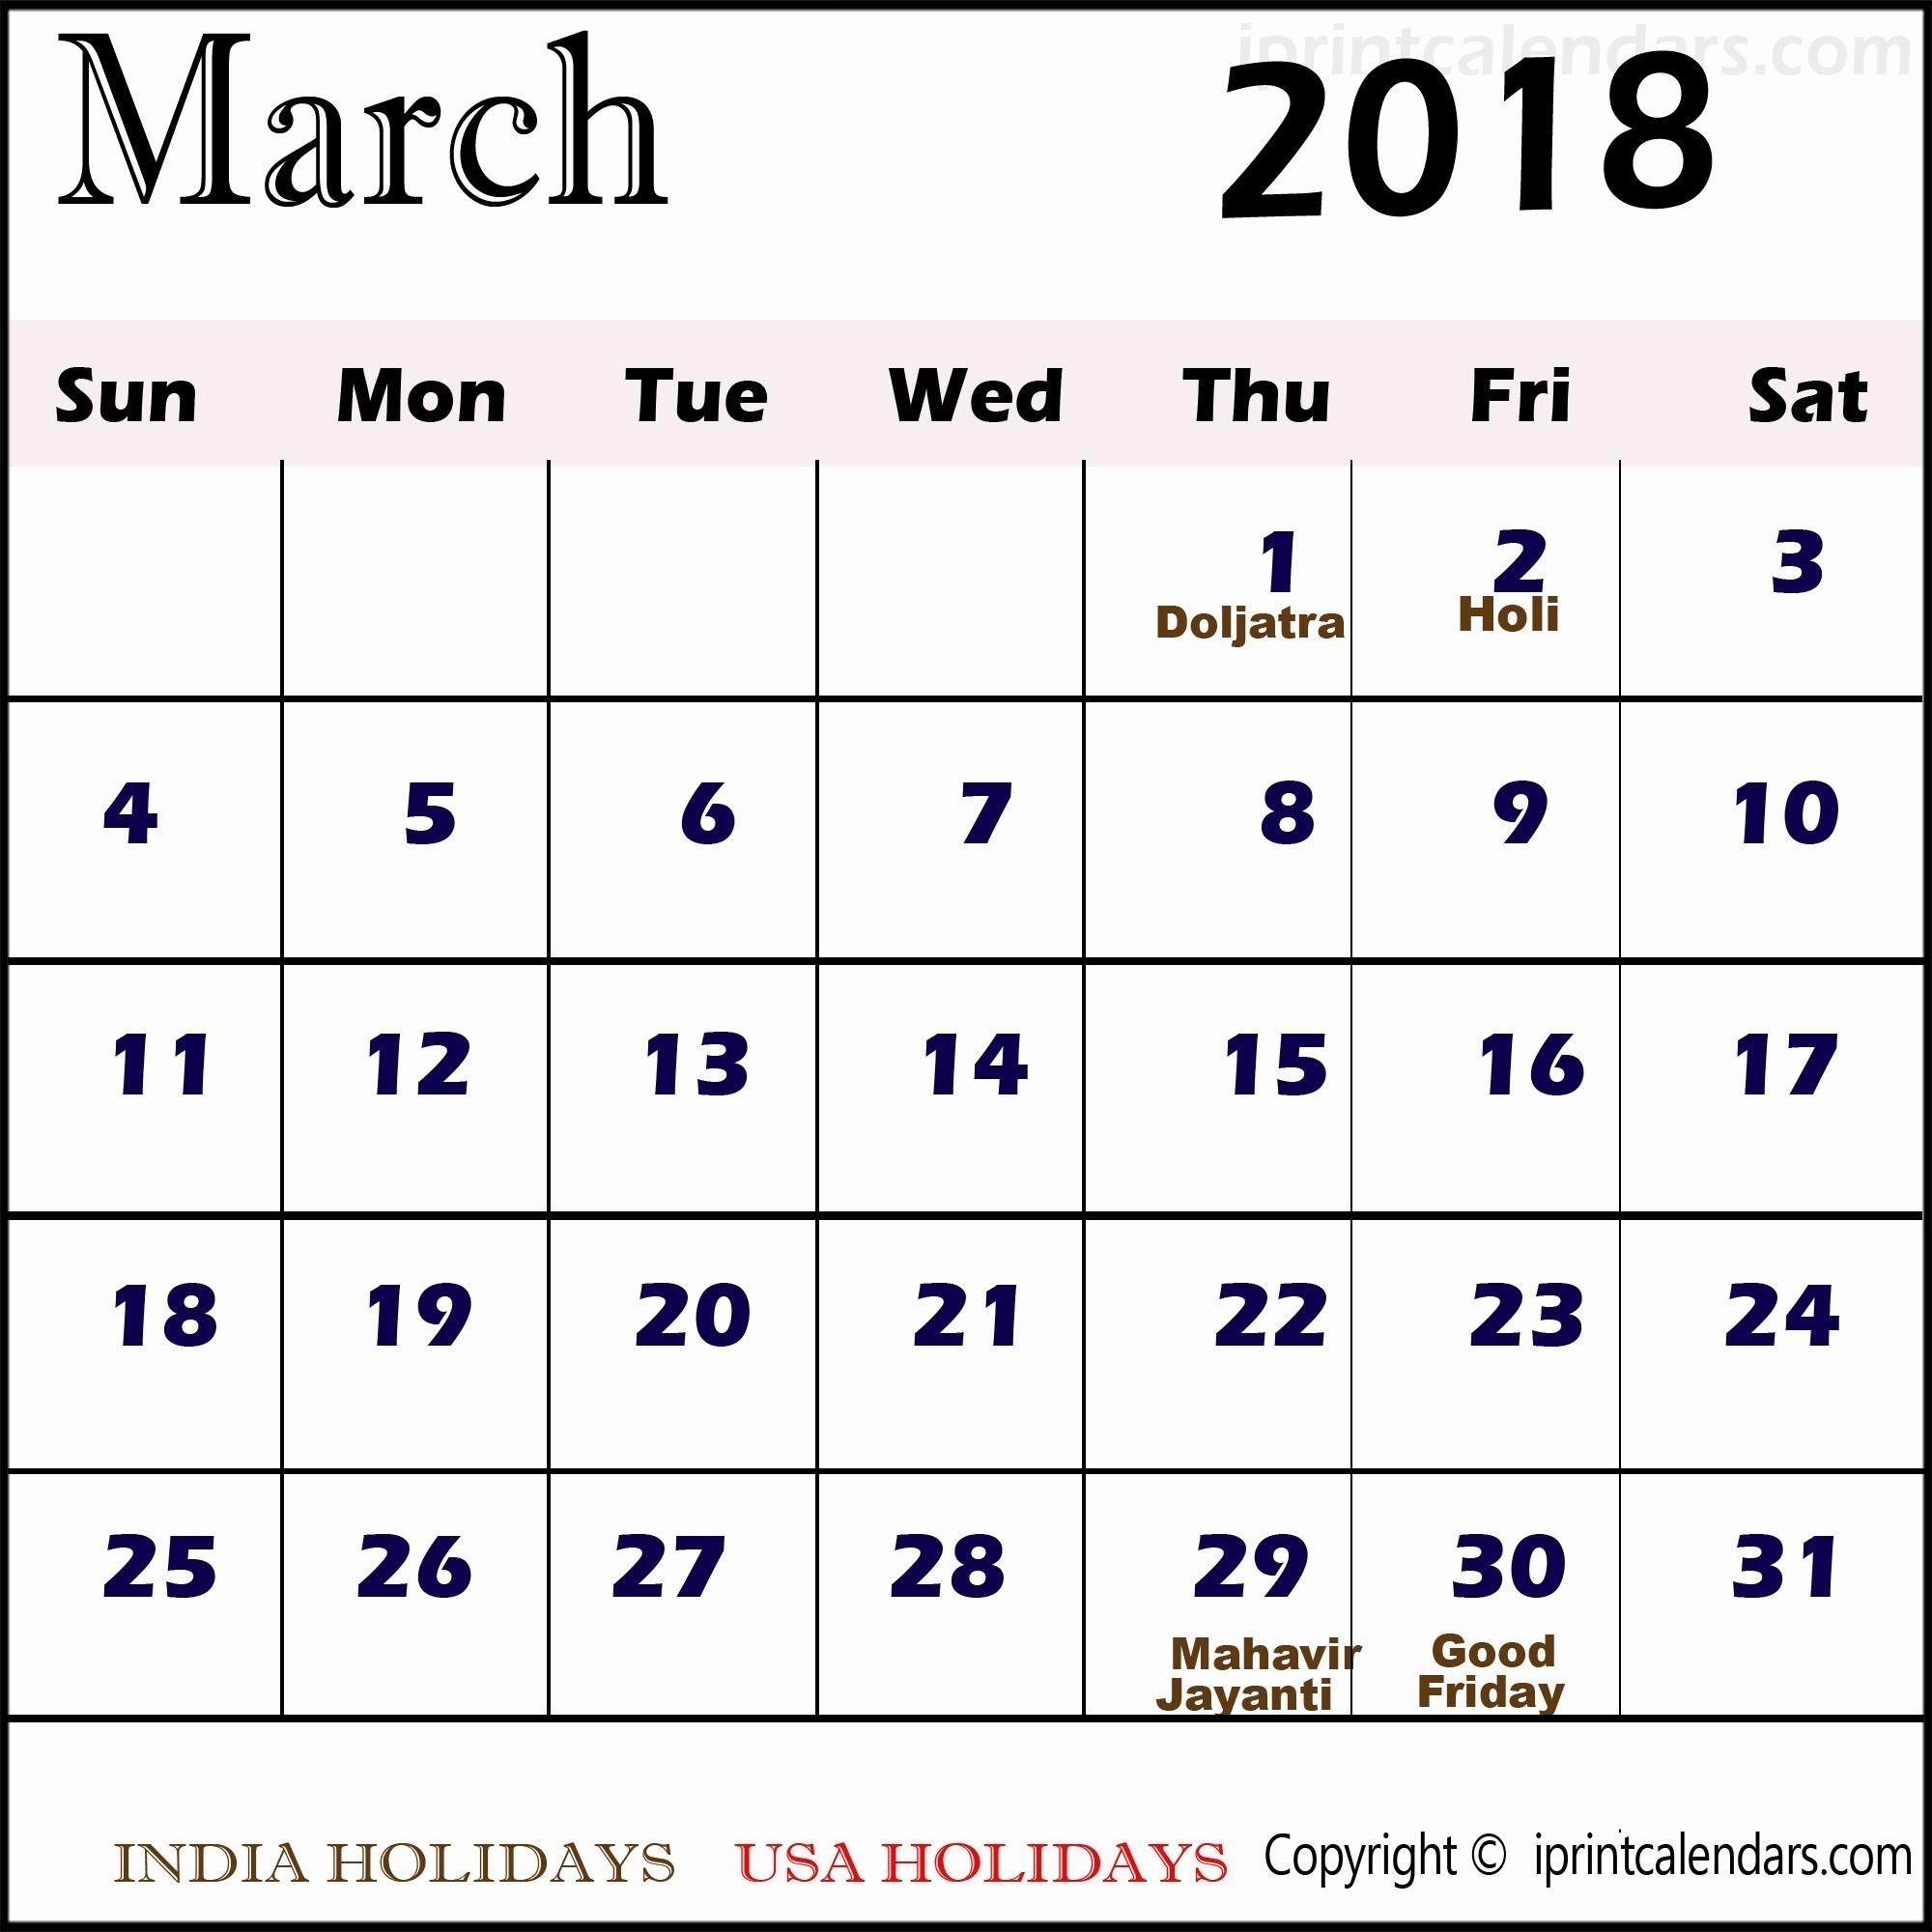 2019 Calendar Holidays